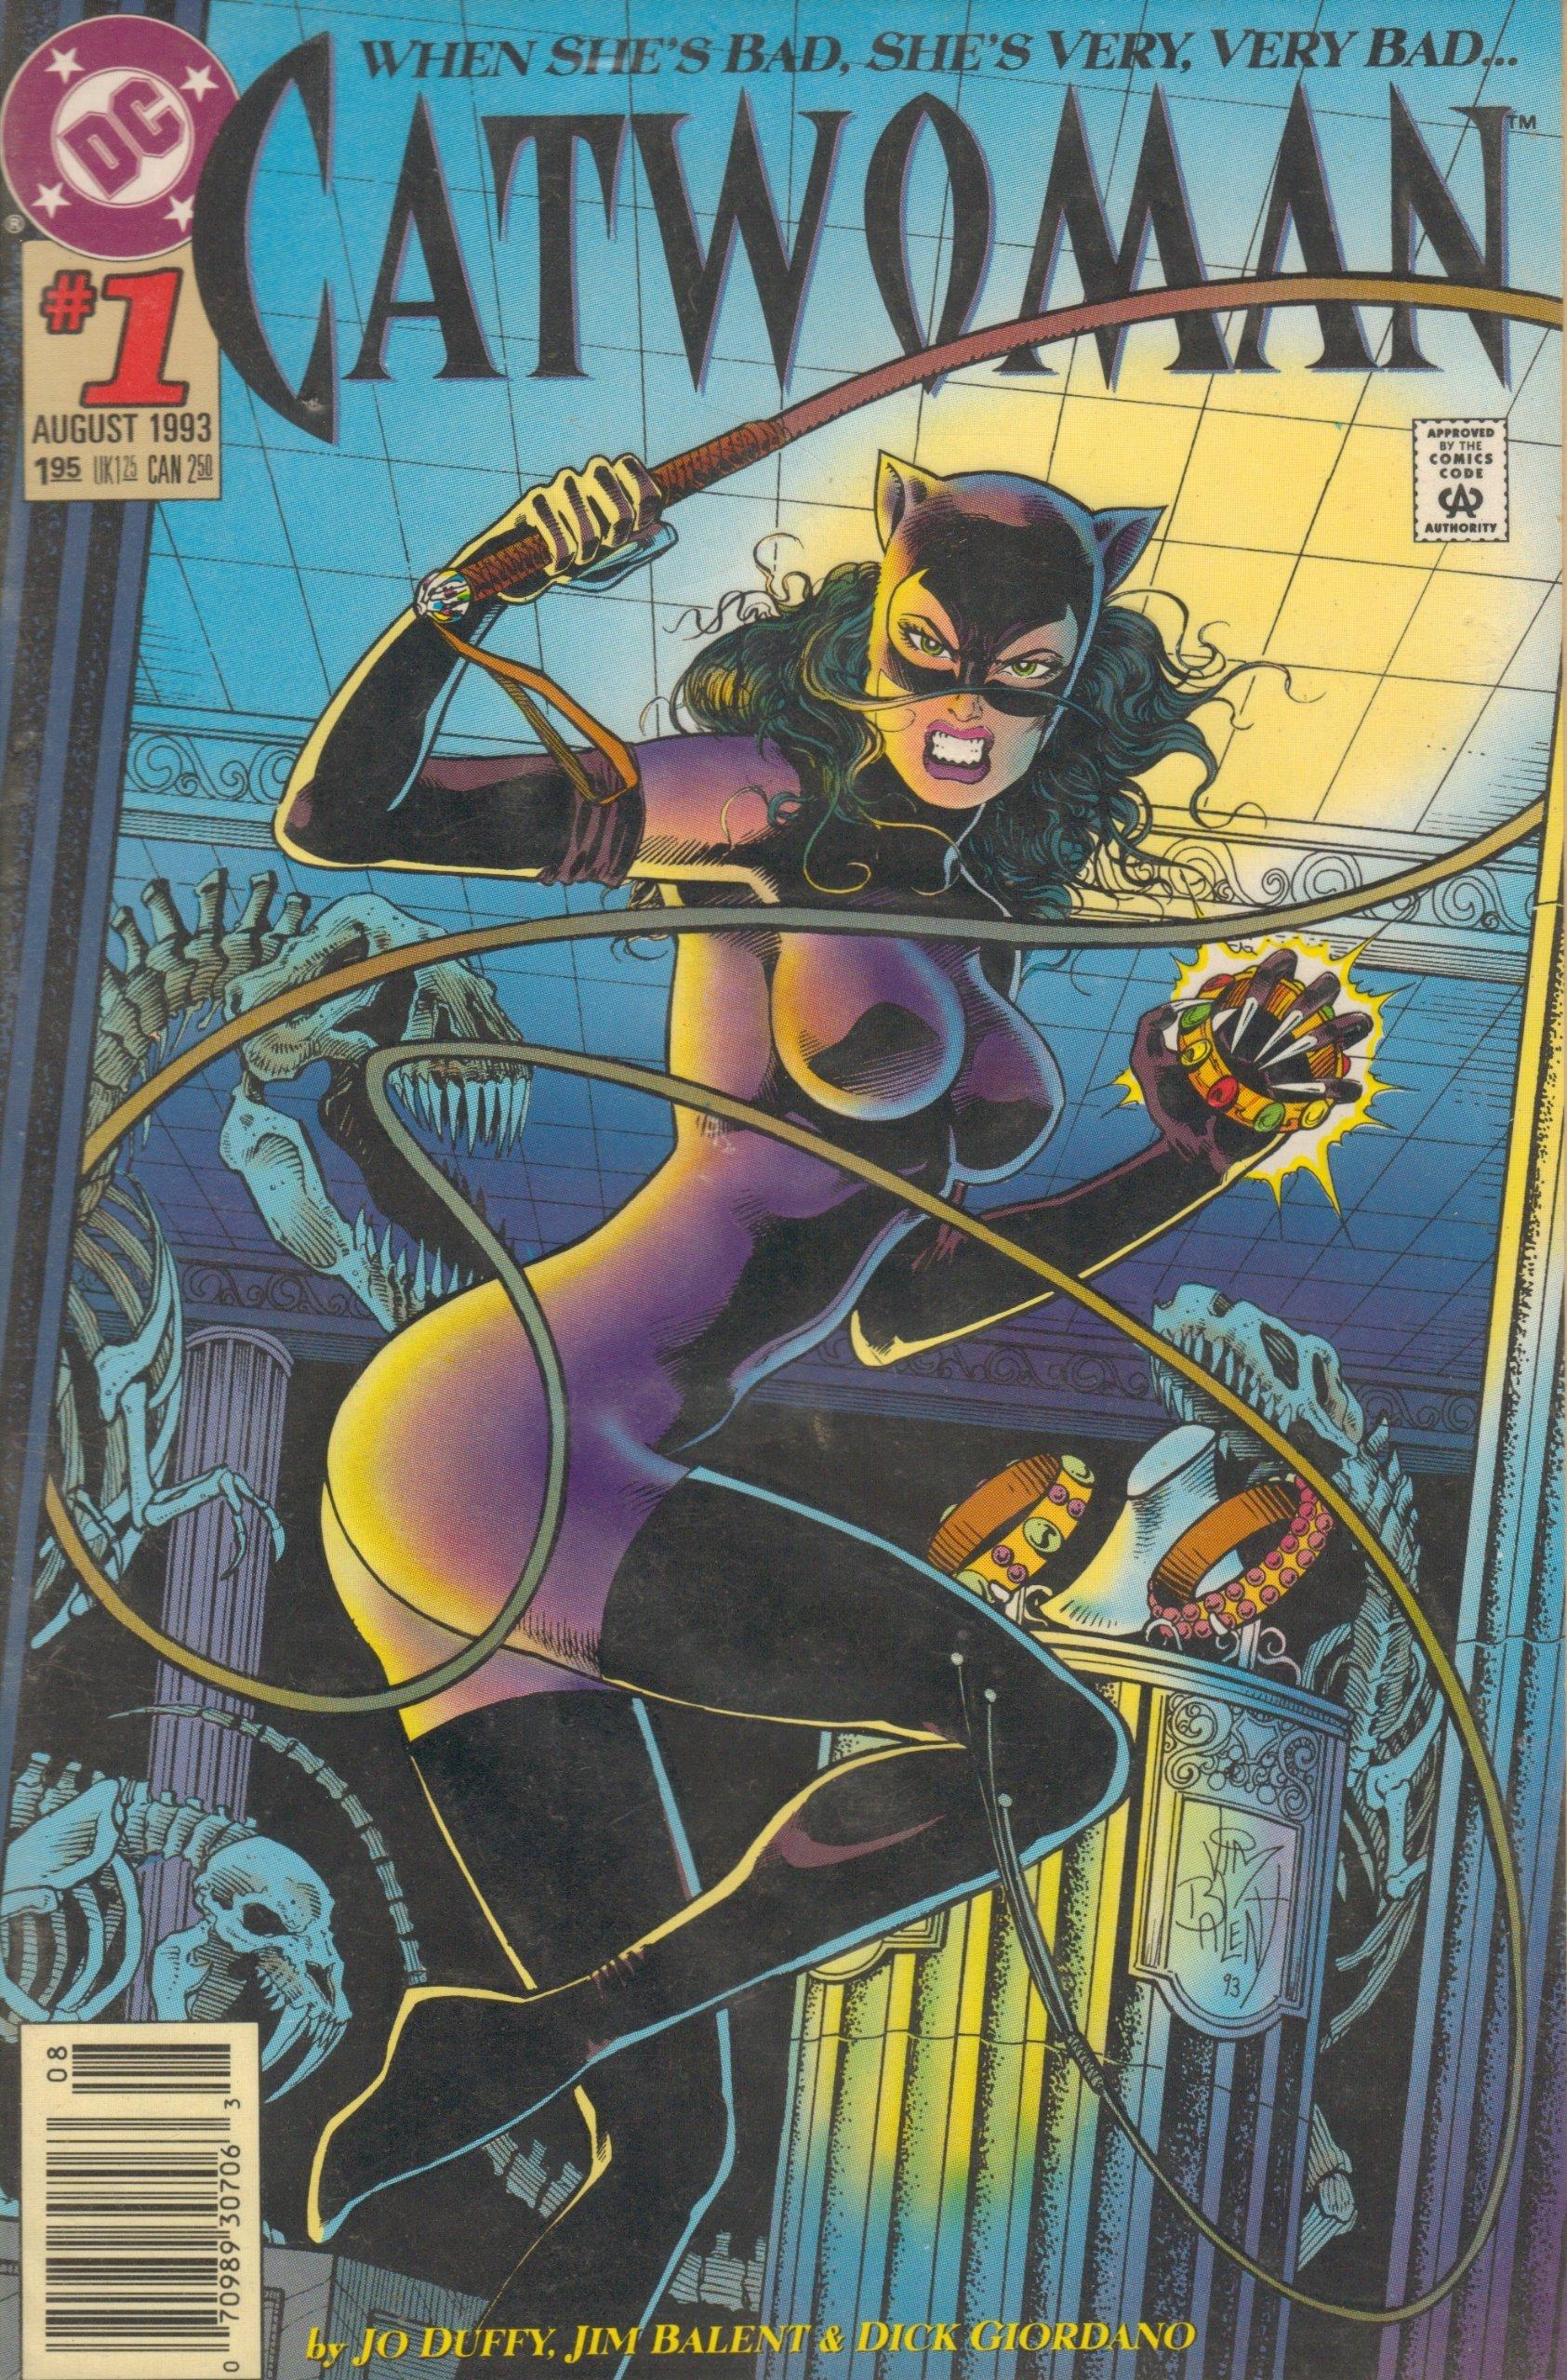 zoë kravitz, the batman, selina kyle, catwoman, robert pattinson